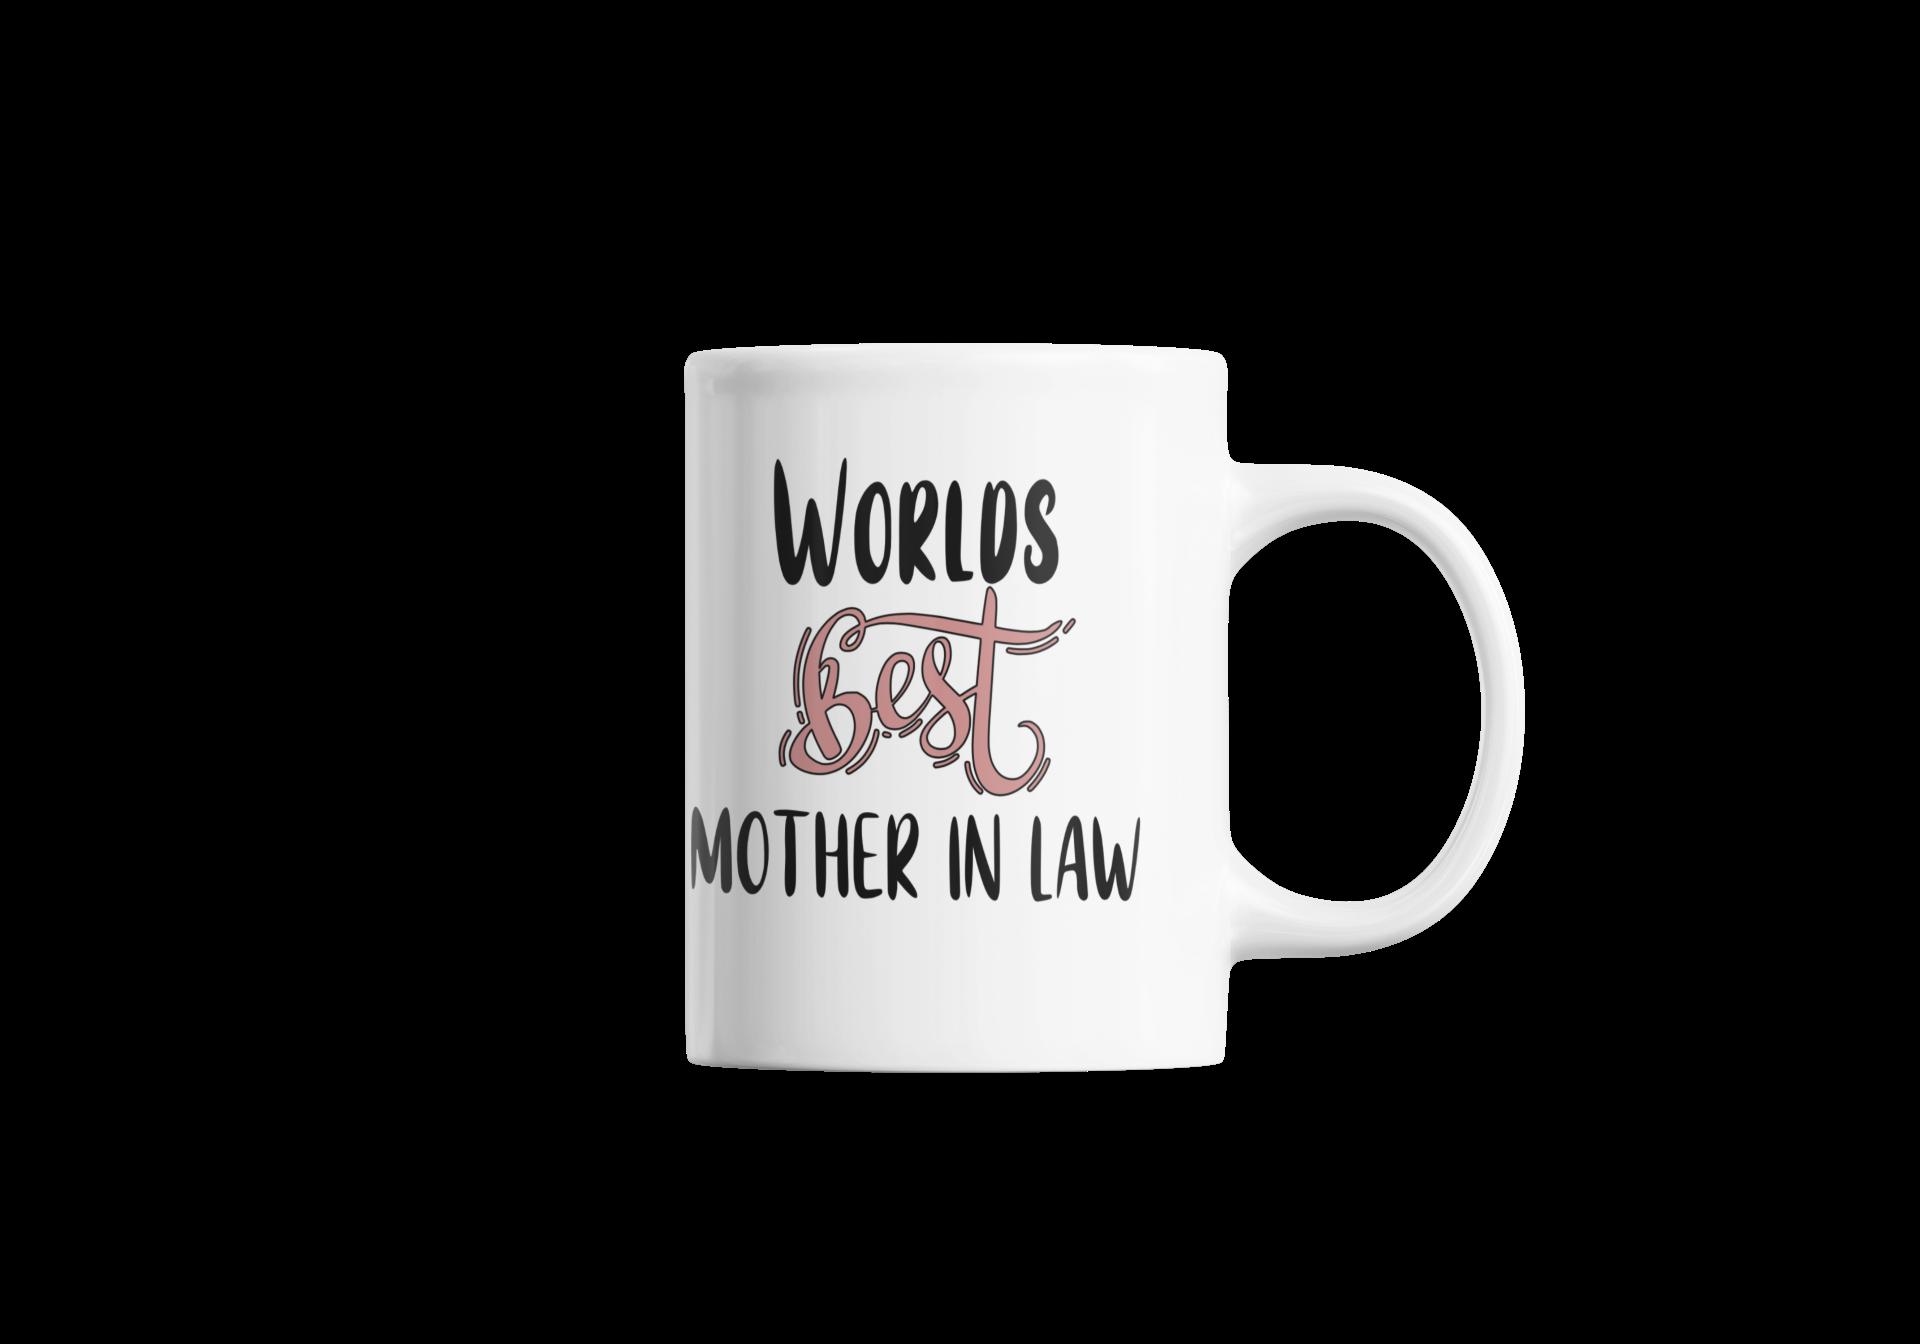 simple-coffee-mug-mockup-featuring-a-cus